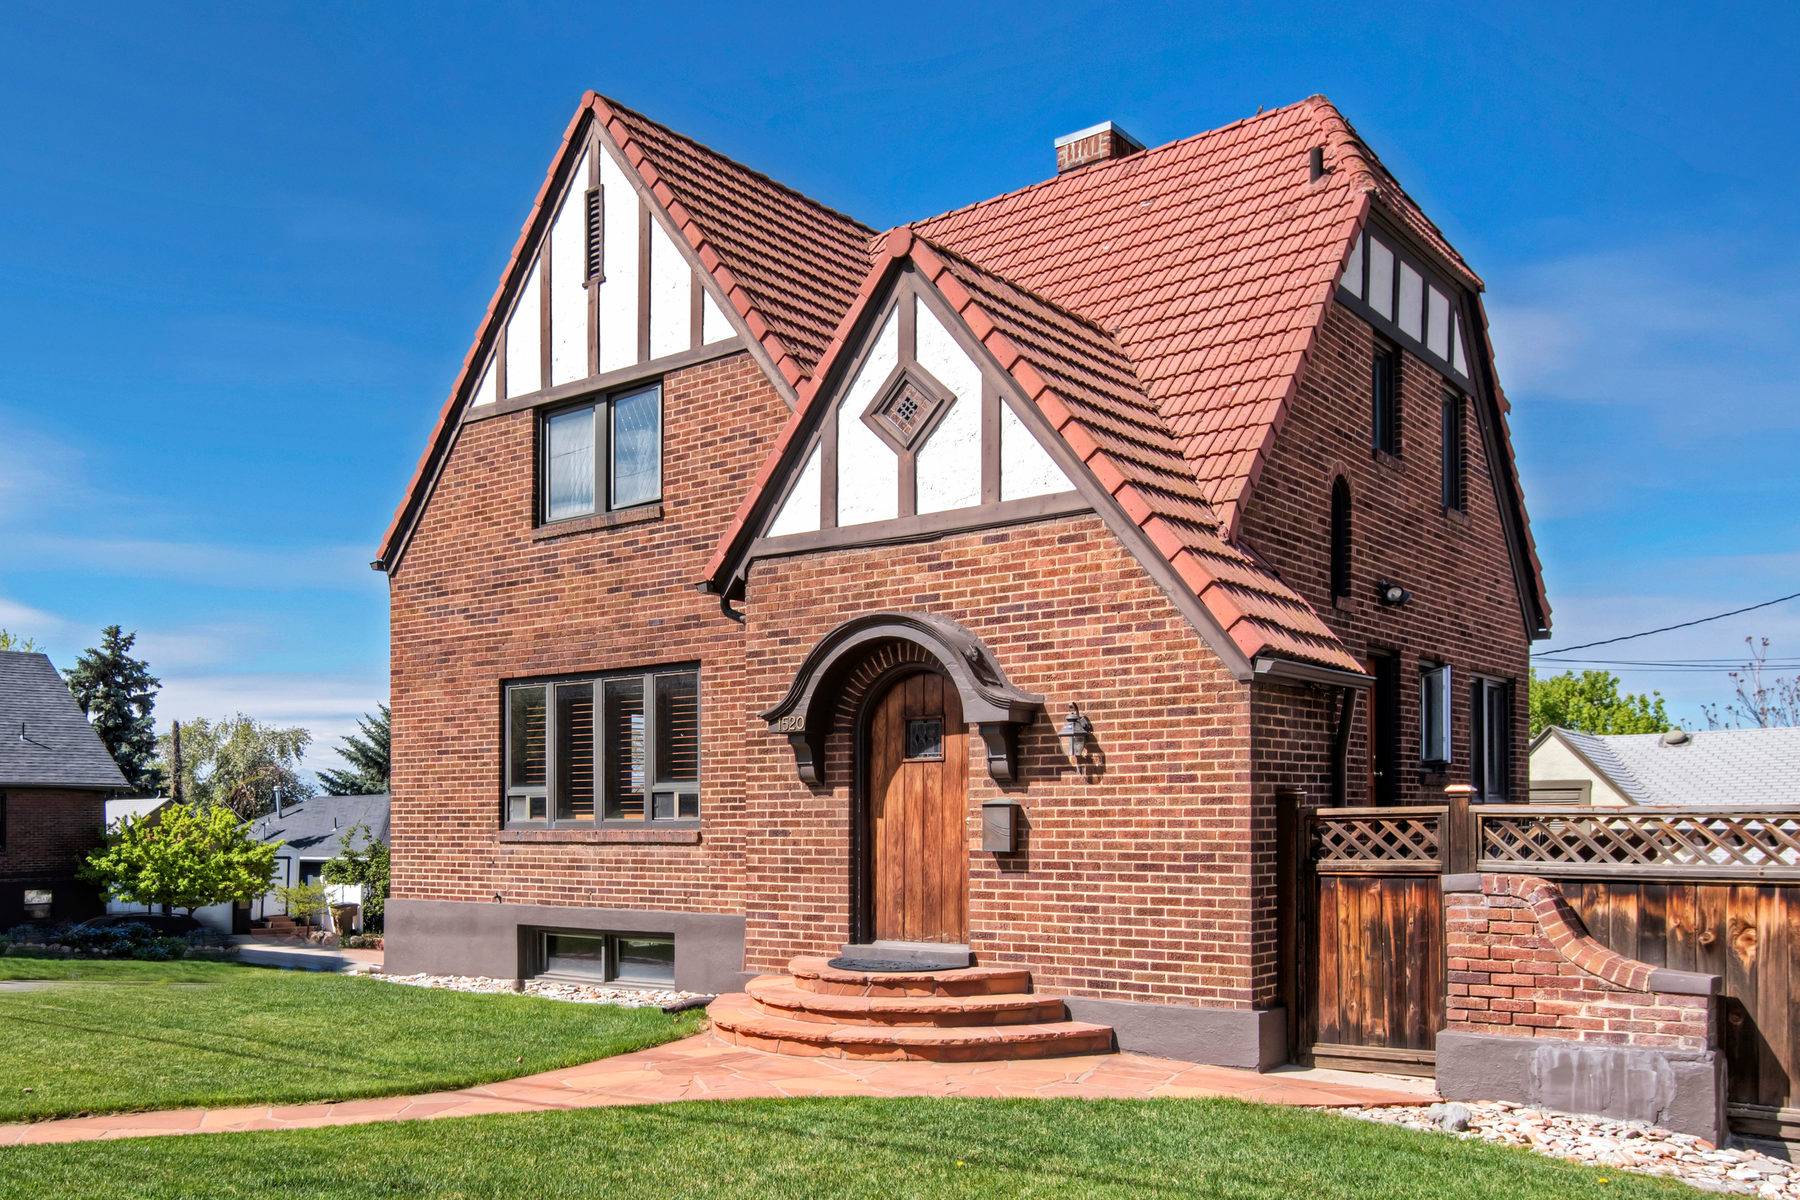 Villa per Vendita alle ore Classic Sugarhouse Tudor 1520 South 1300 East Salt Lake City, Utah, 84105 Stati Uniti